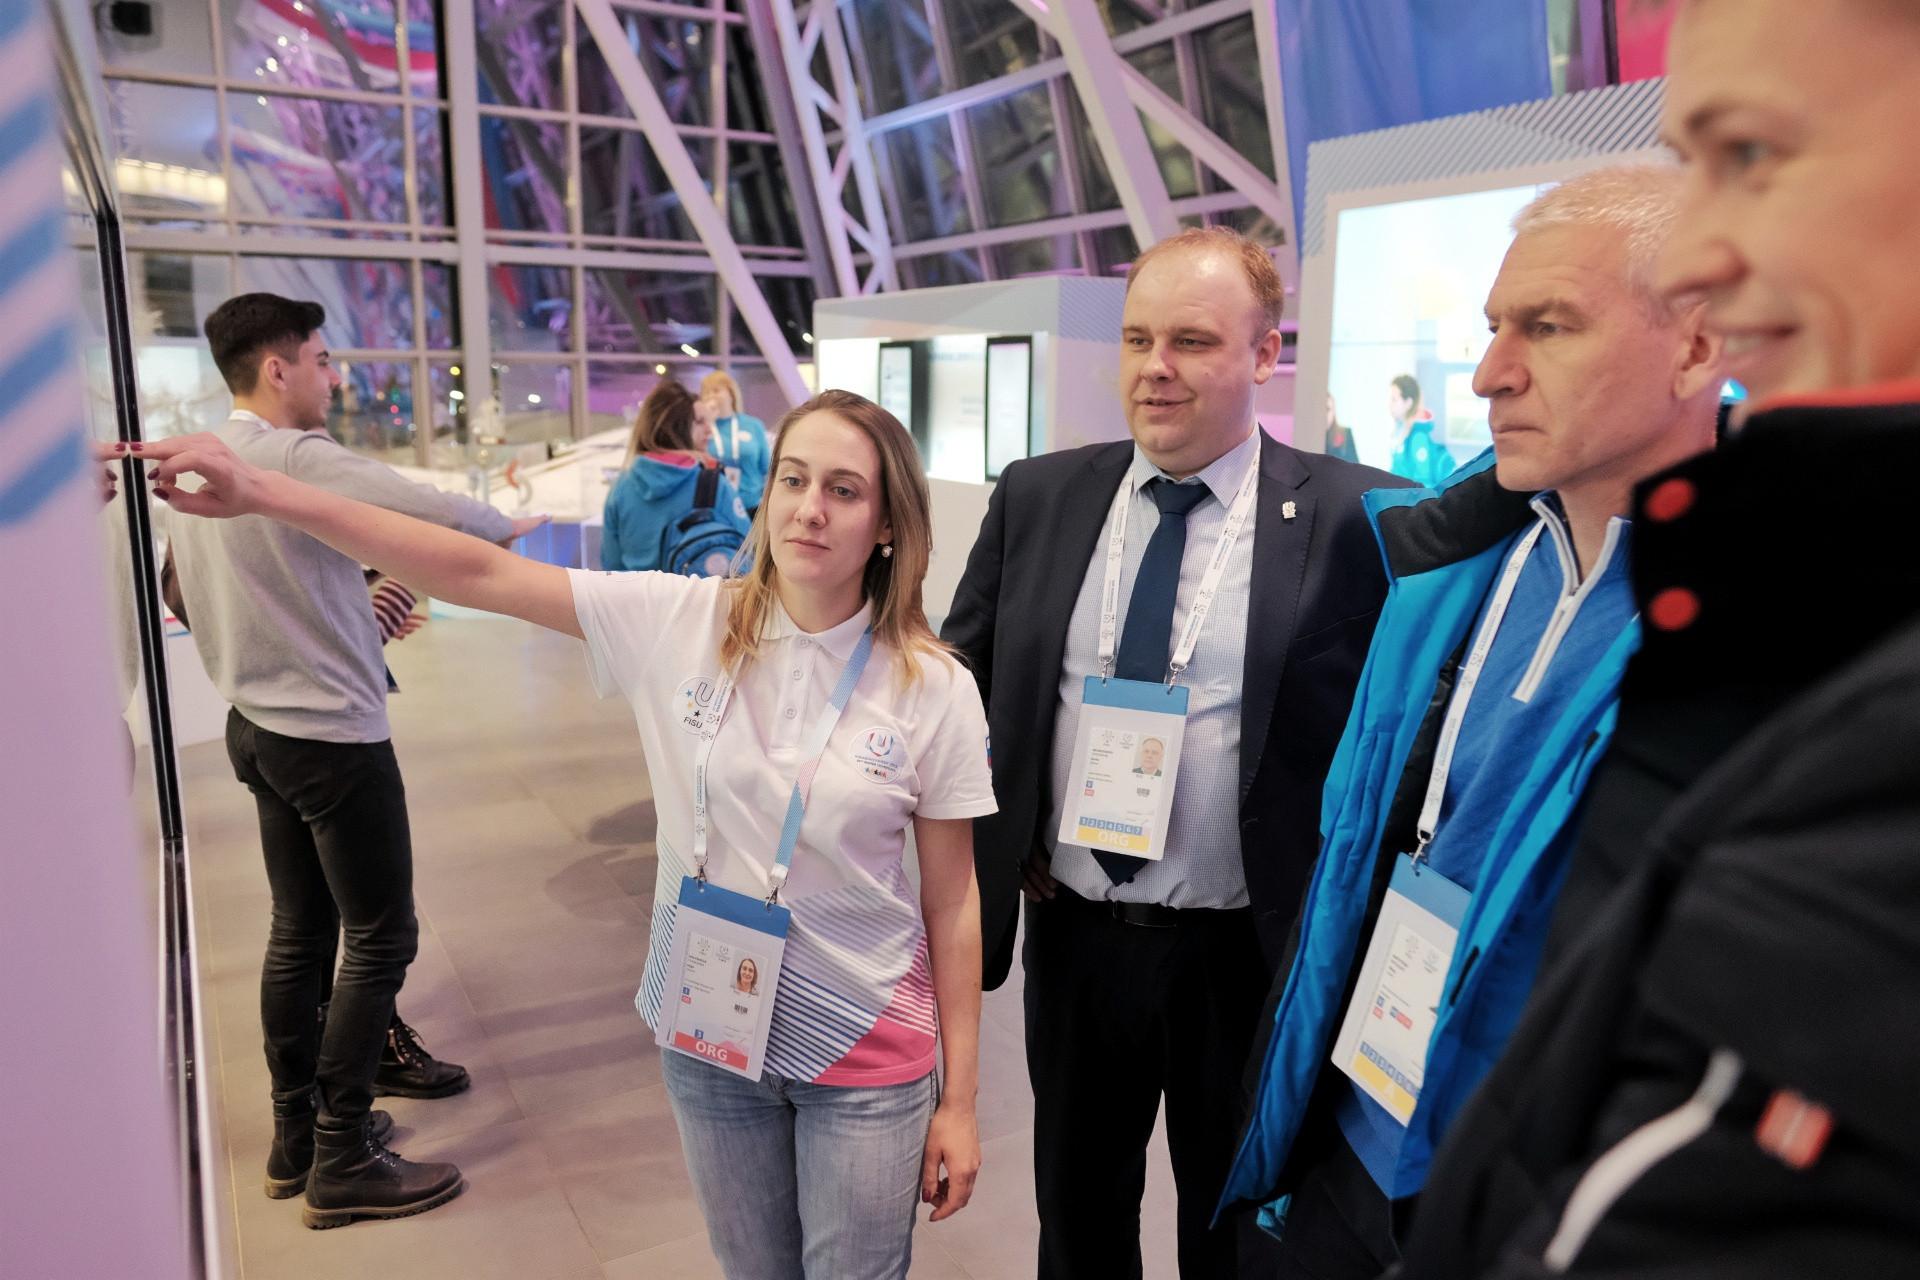 FISU President, Oleg Matytsin said he thought the museum was